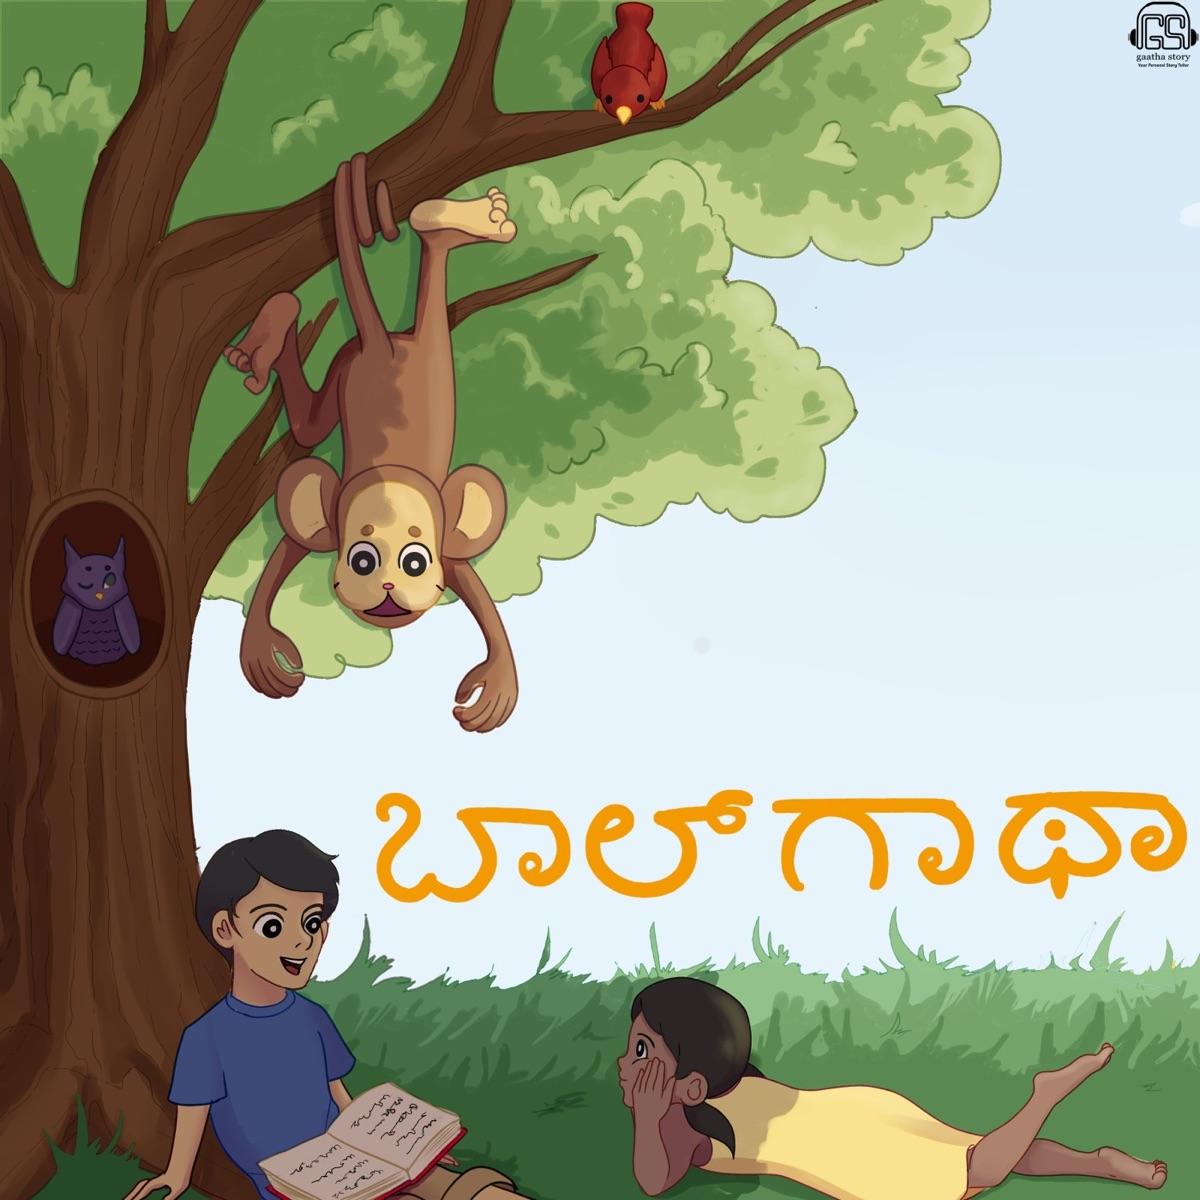 Baalgatha Kannada ಬಾಲ್ ಗಾಥಾ ಕನ್ನಡ